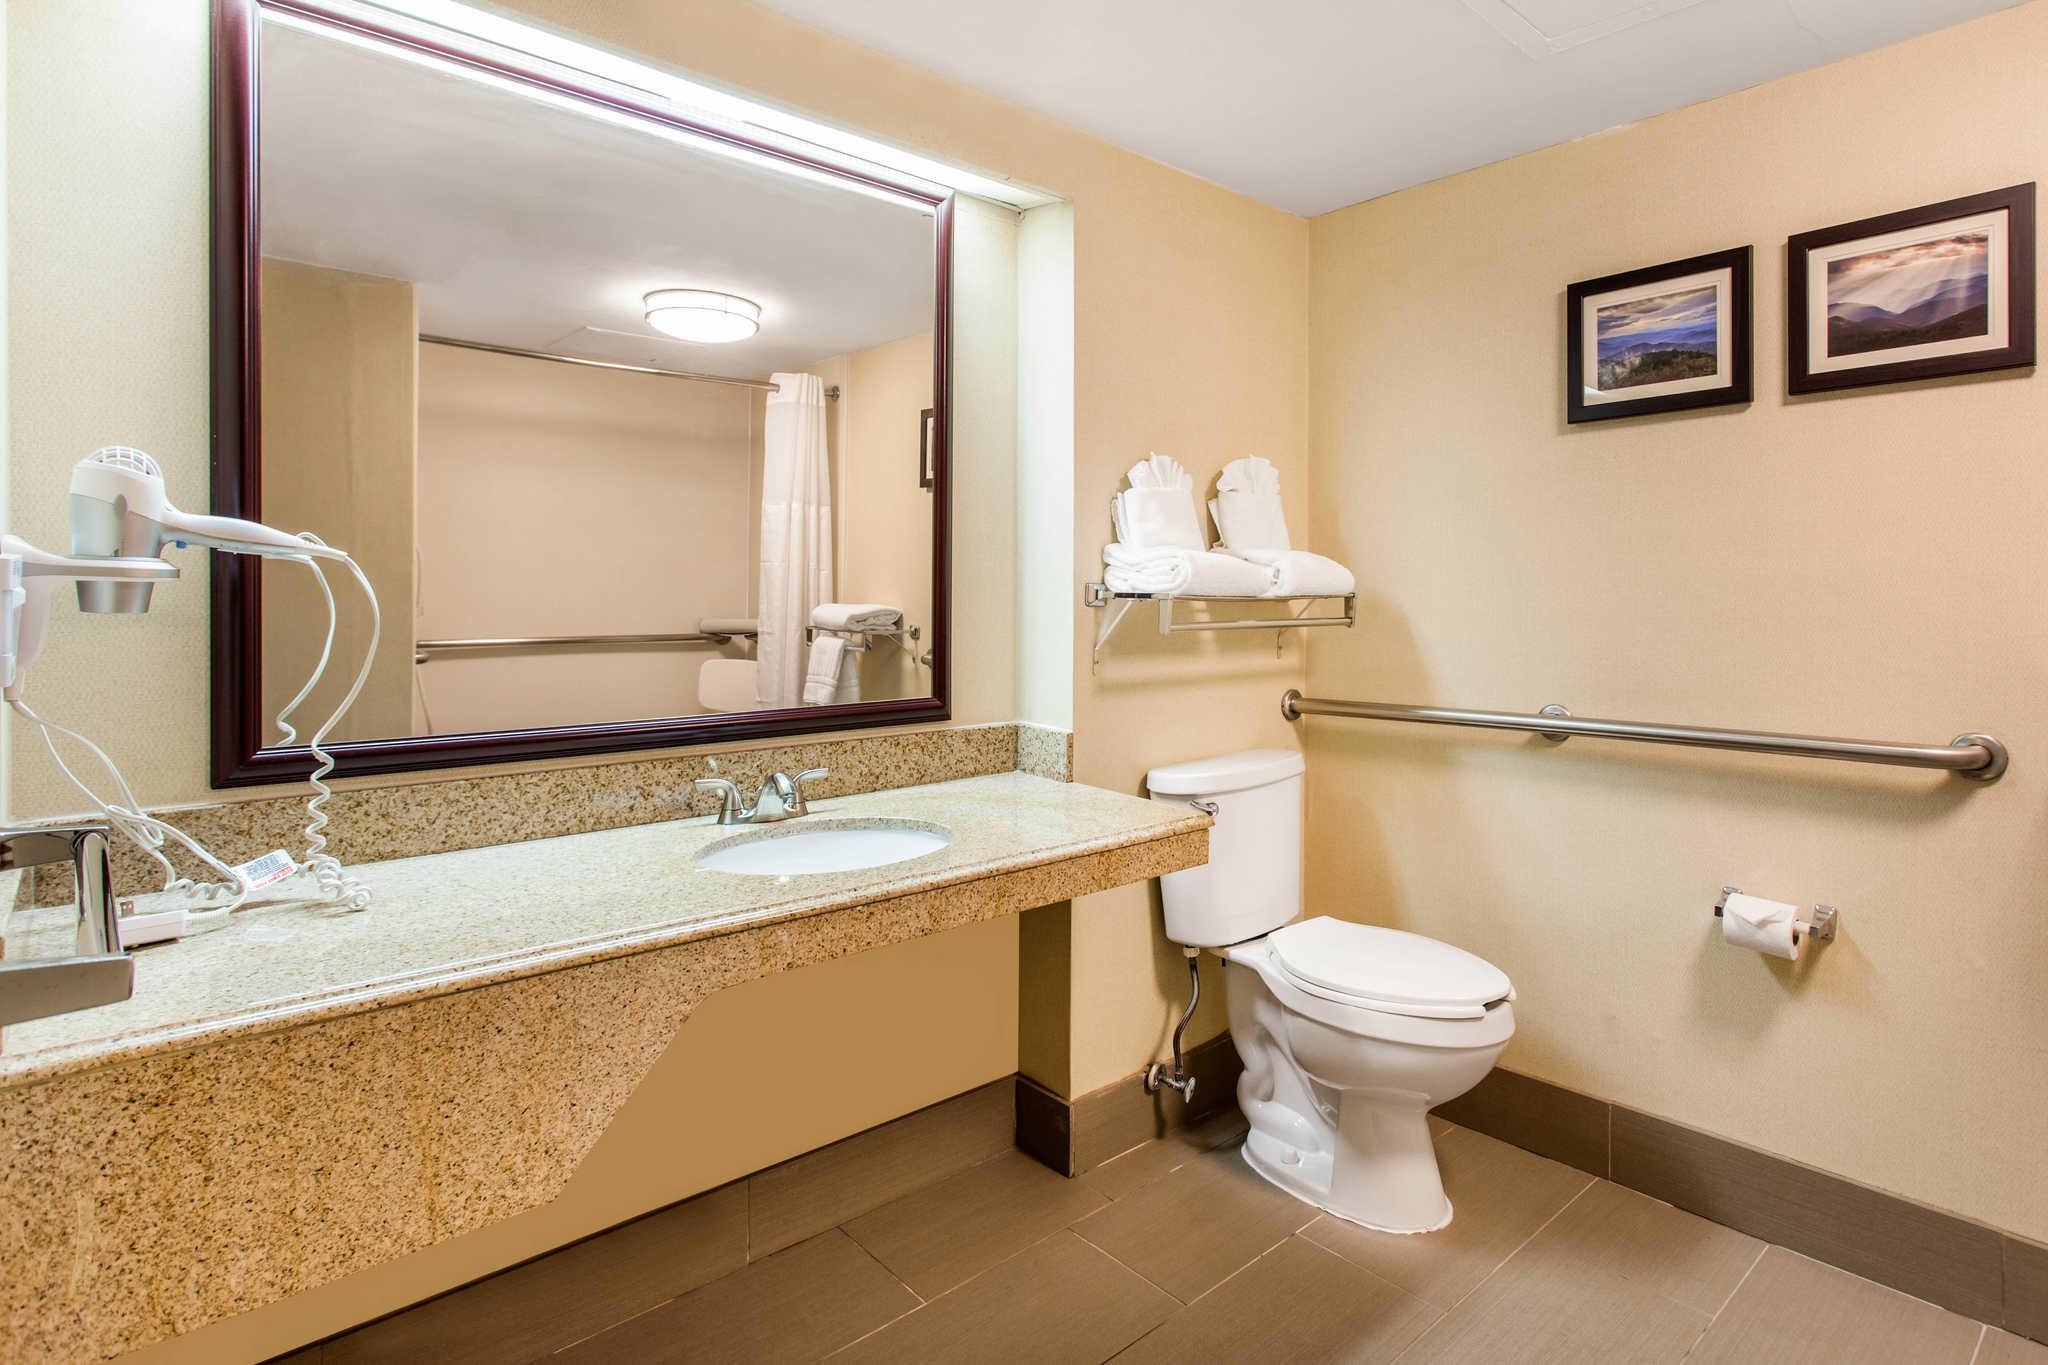 Comfort Inn & Suites Crabtree Valley image 12